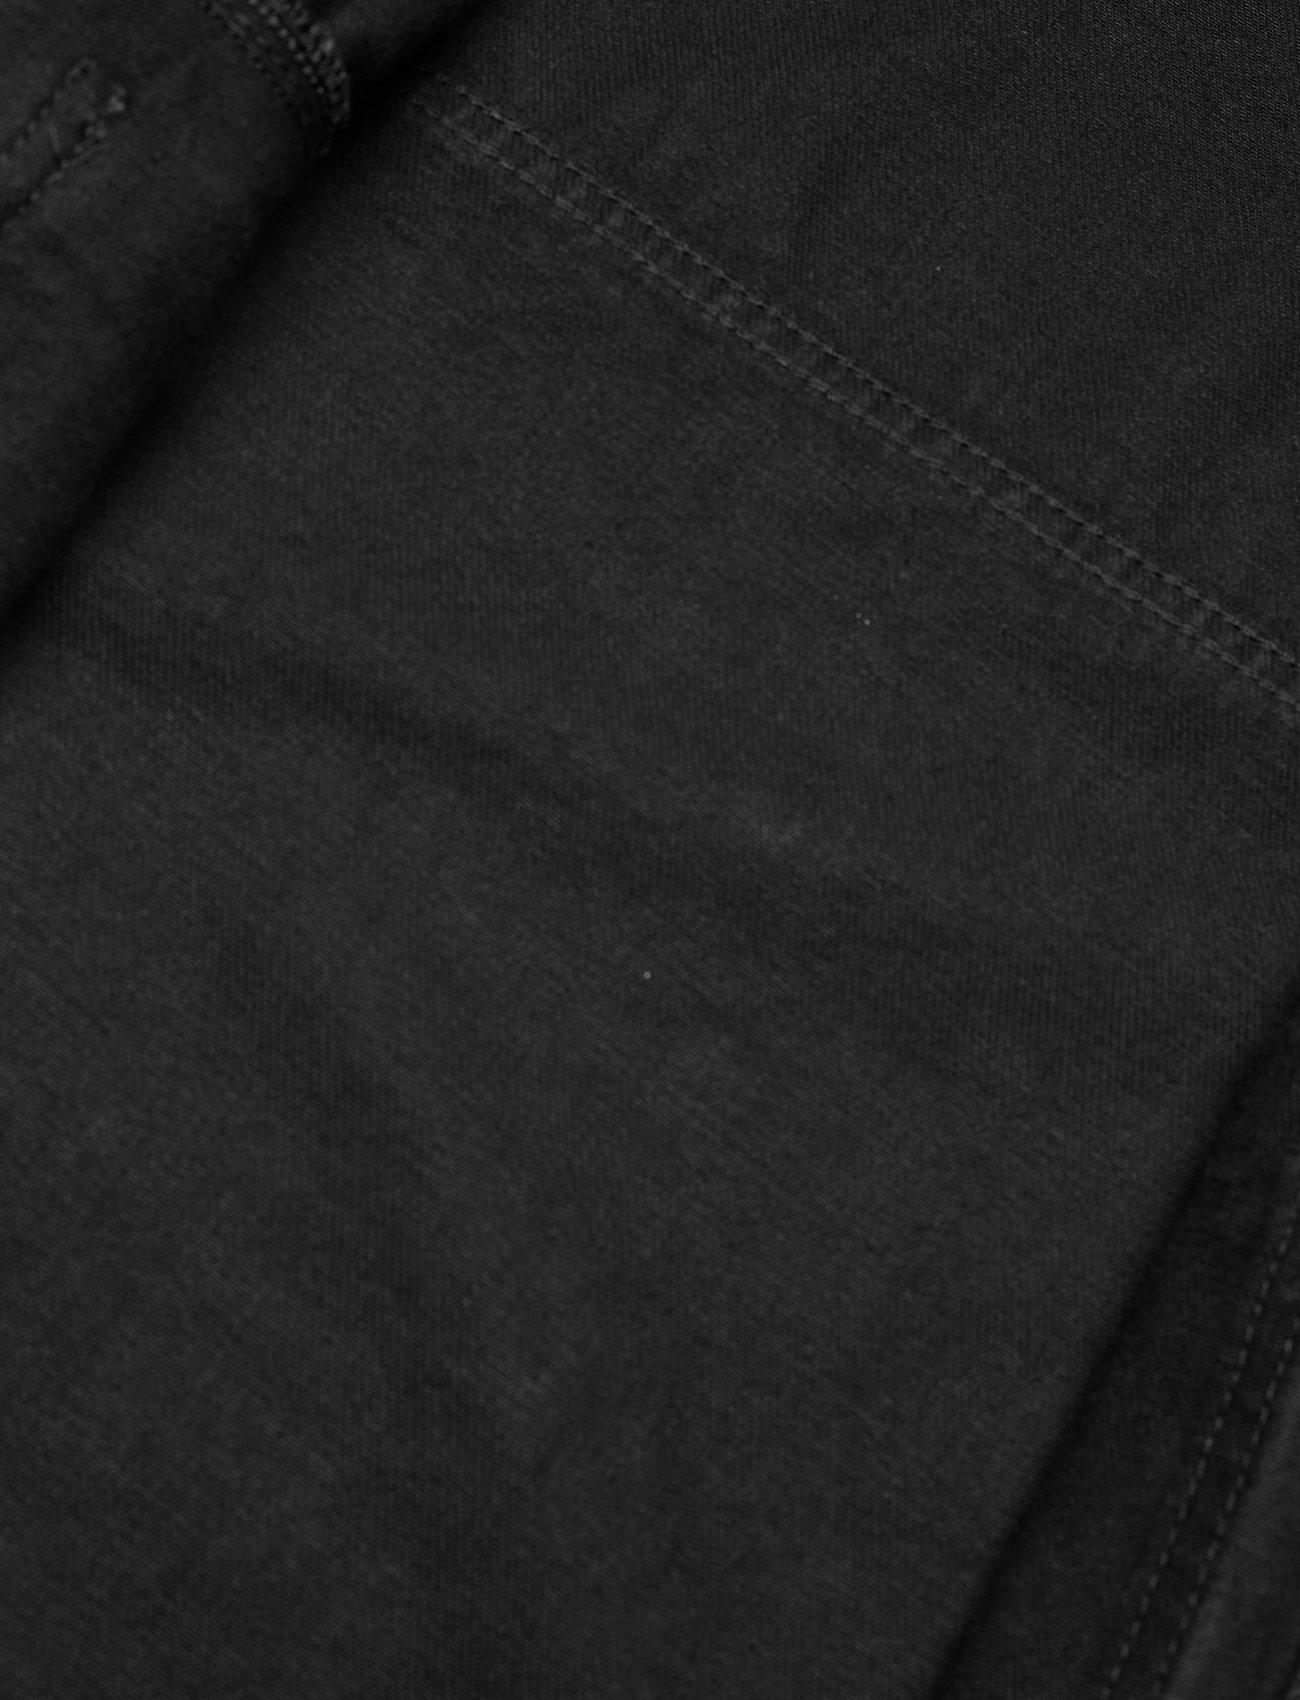 Mother of Pearl - BRENNON DENIM JACKET - spijkerjassen - black - 5